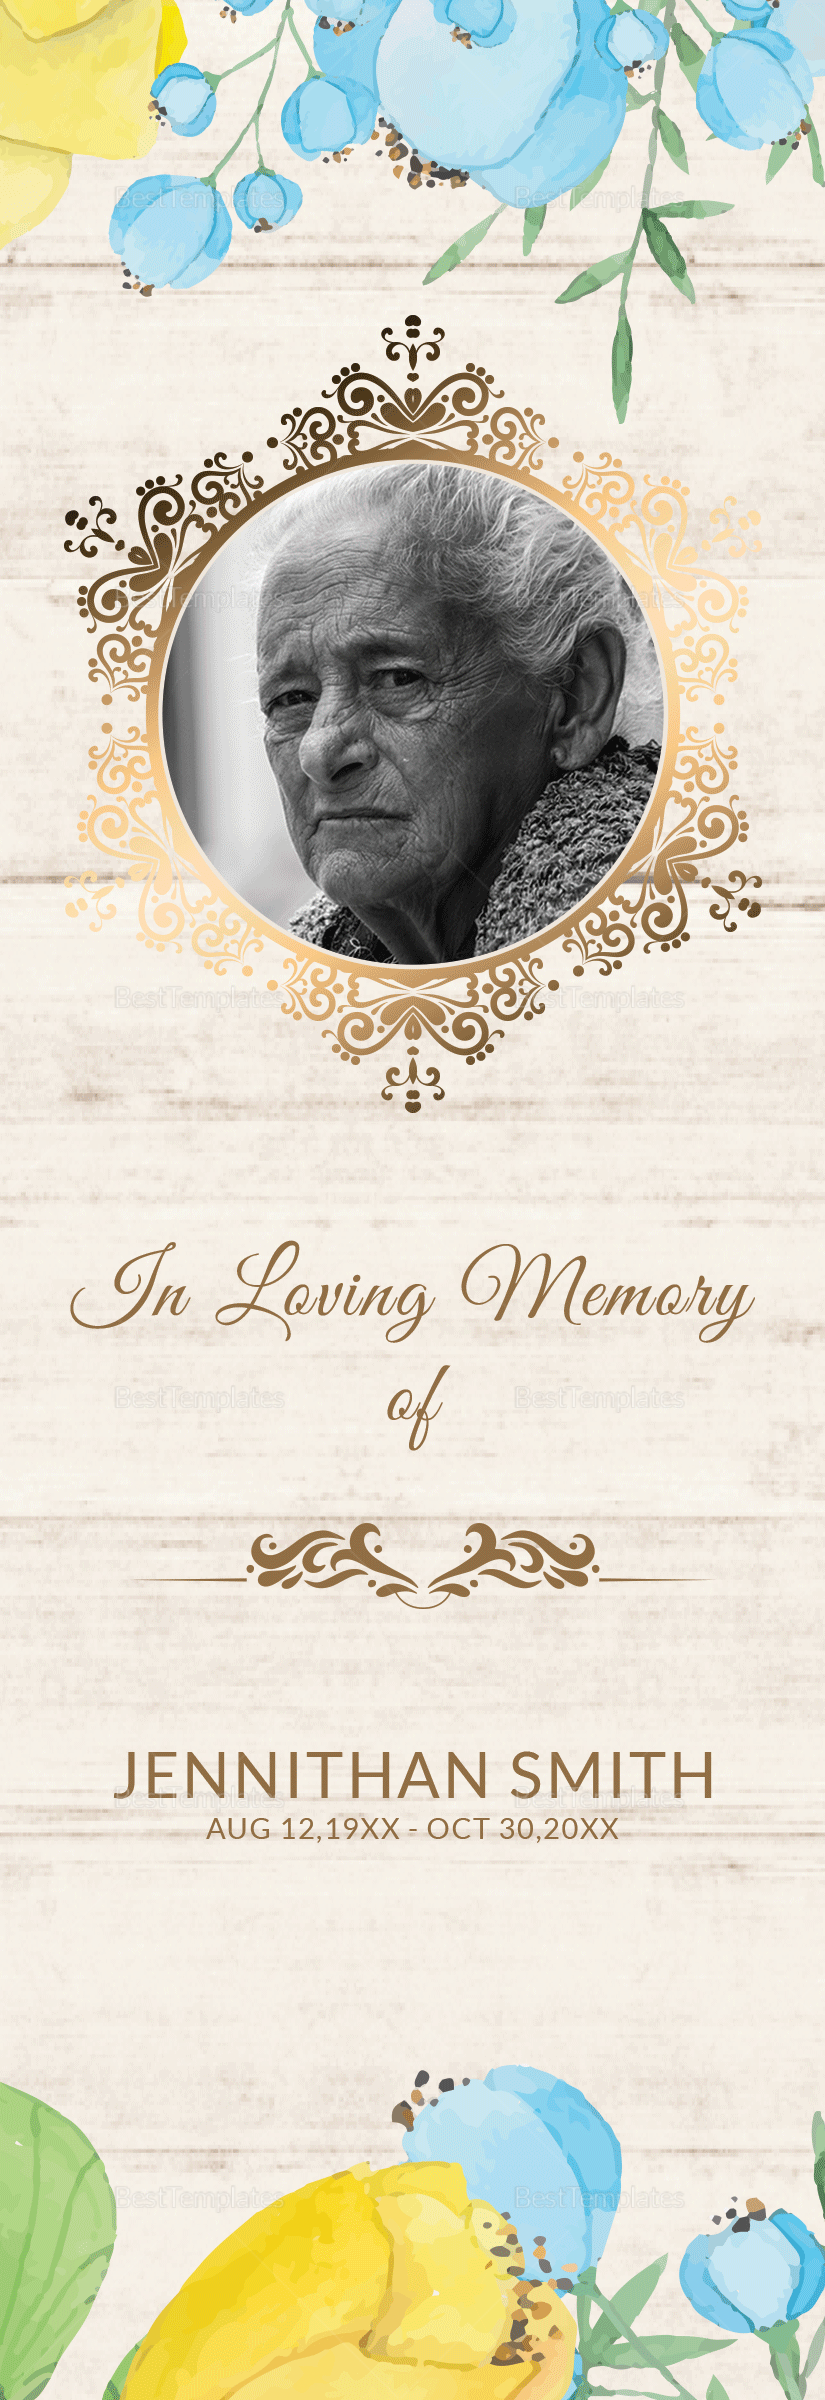 Memorial Service Bookmark